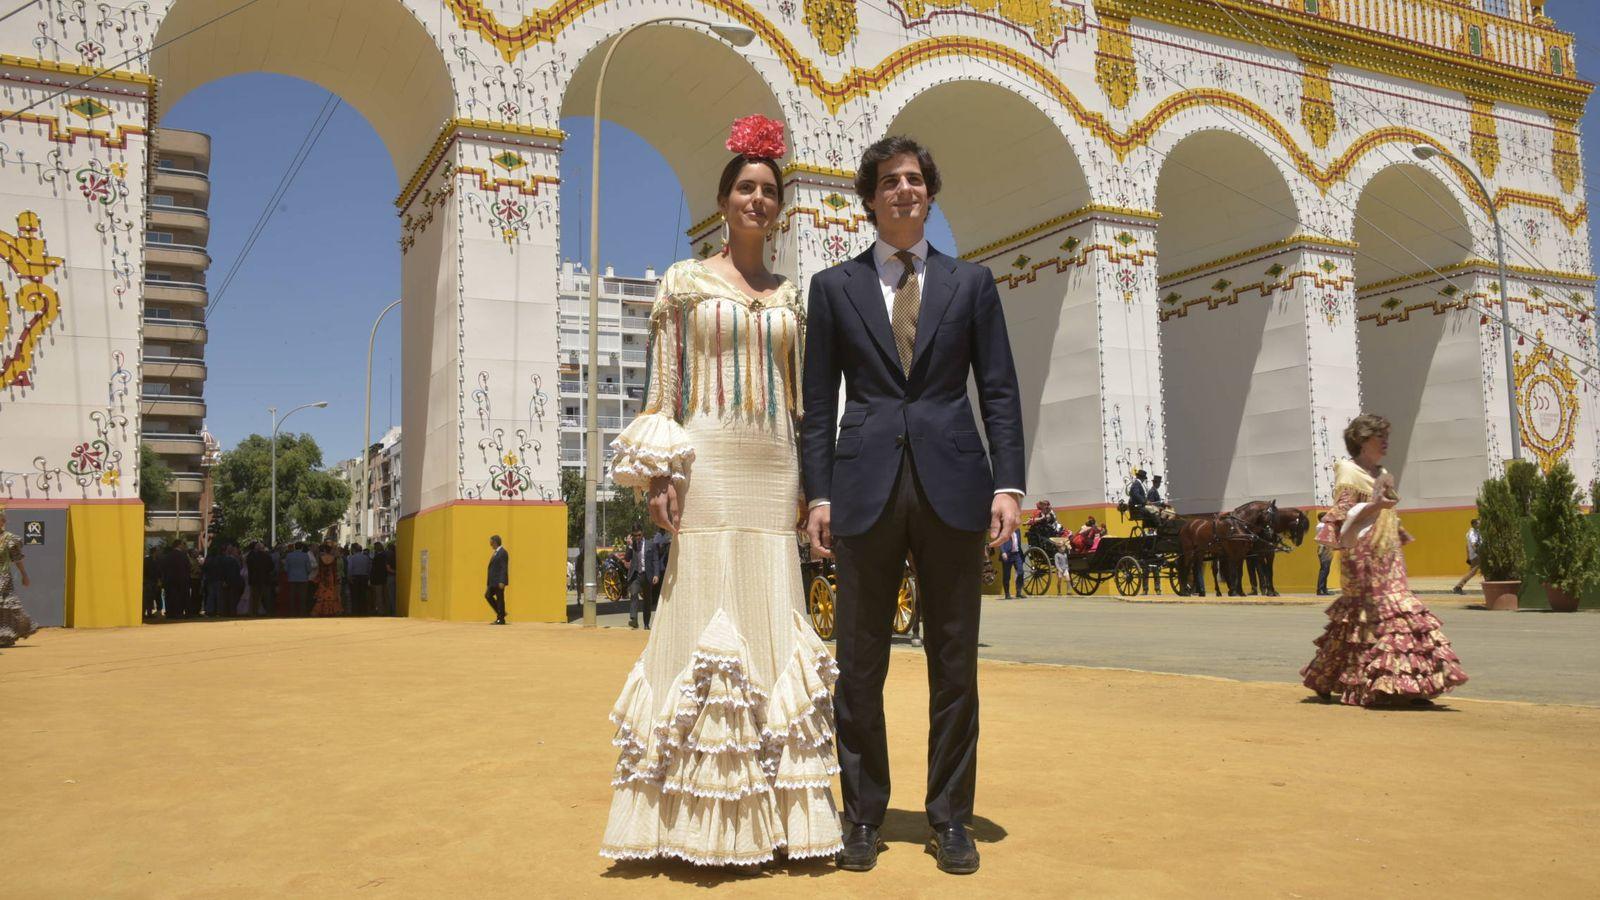 Foto: Sofía Palazuelo y Fernando Fitz-James Stuart en la Feria de Abril. (Sevilla Press)